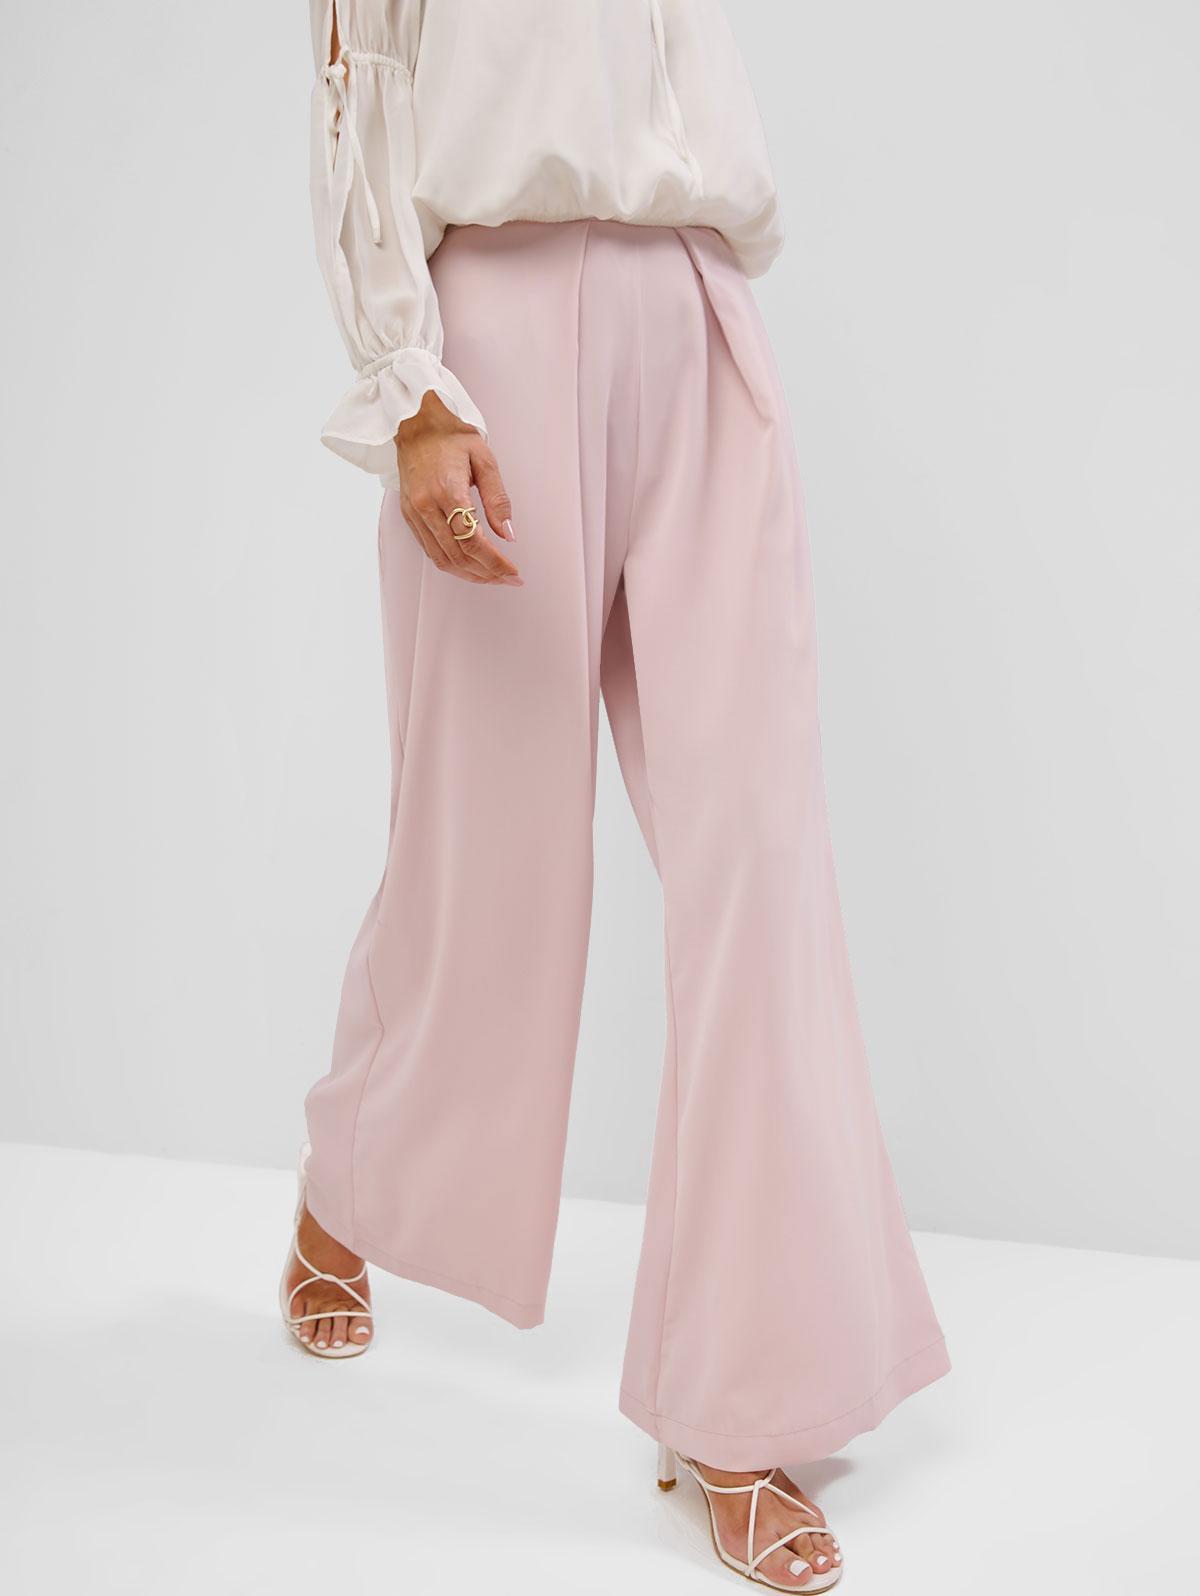 Side Zipper Solid High Waisted Wide Leg Pants